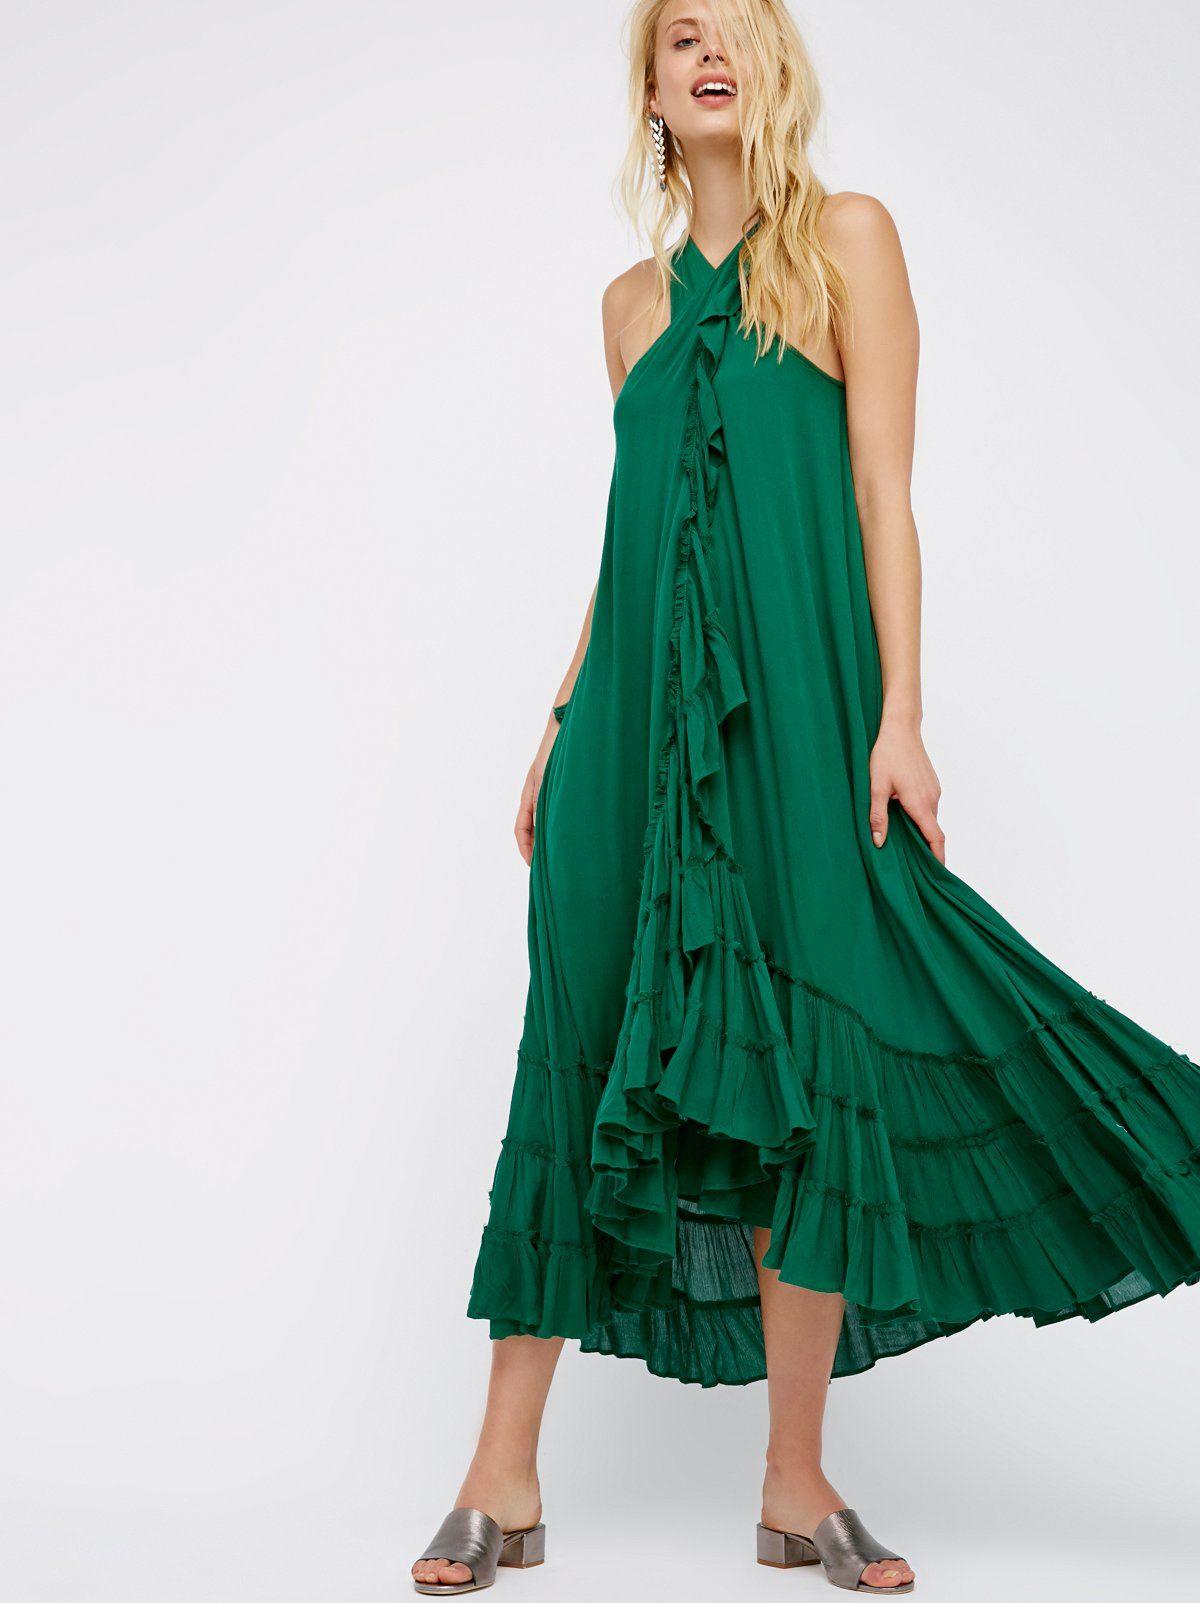 Wrap Around Maxi Dress Maxi Dress Long Wrap Dress Long Dress Casual Summer [ 1603 x 1200 Pixel ]